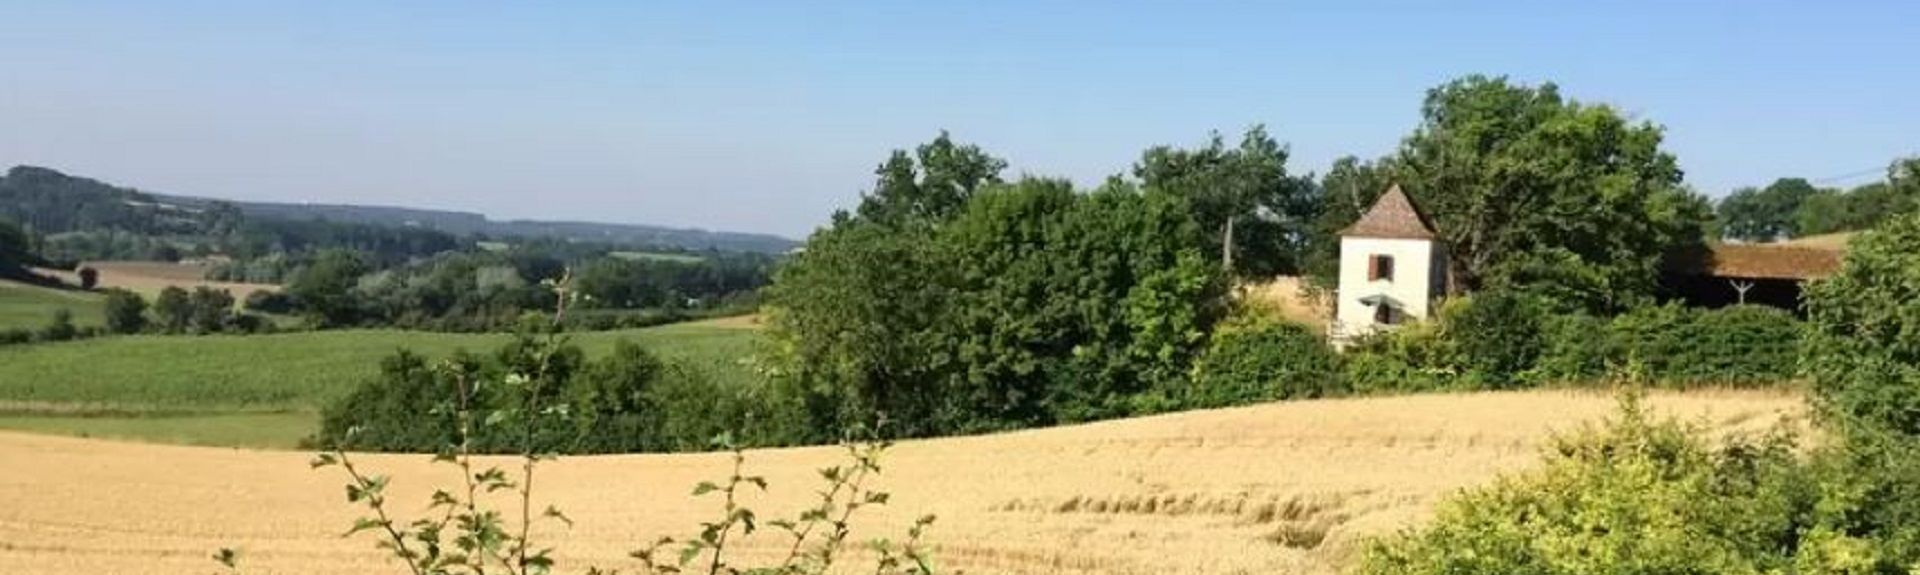 Blanquefort-sur-Briolance, Lot-et-Garonne, Frankrijk